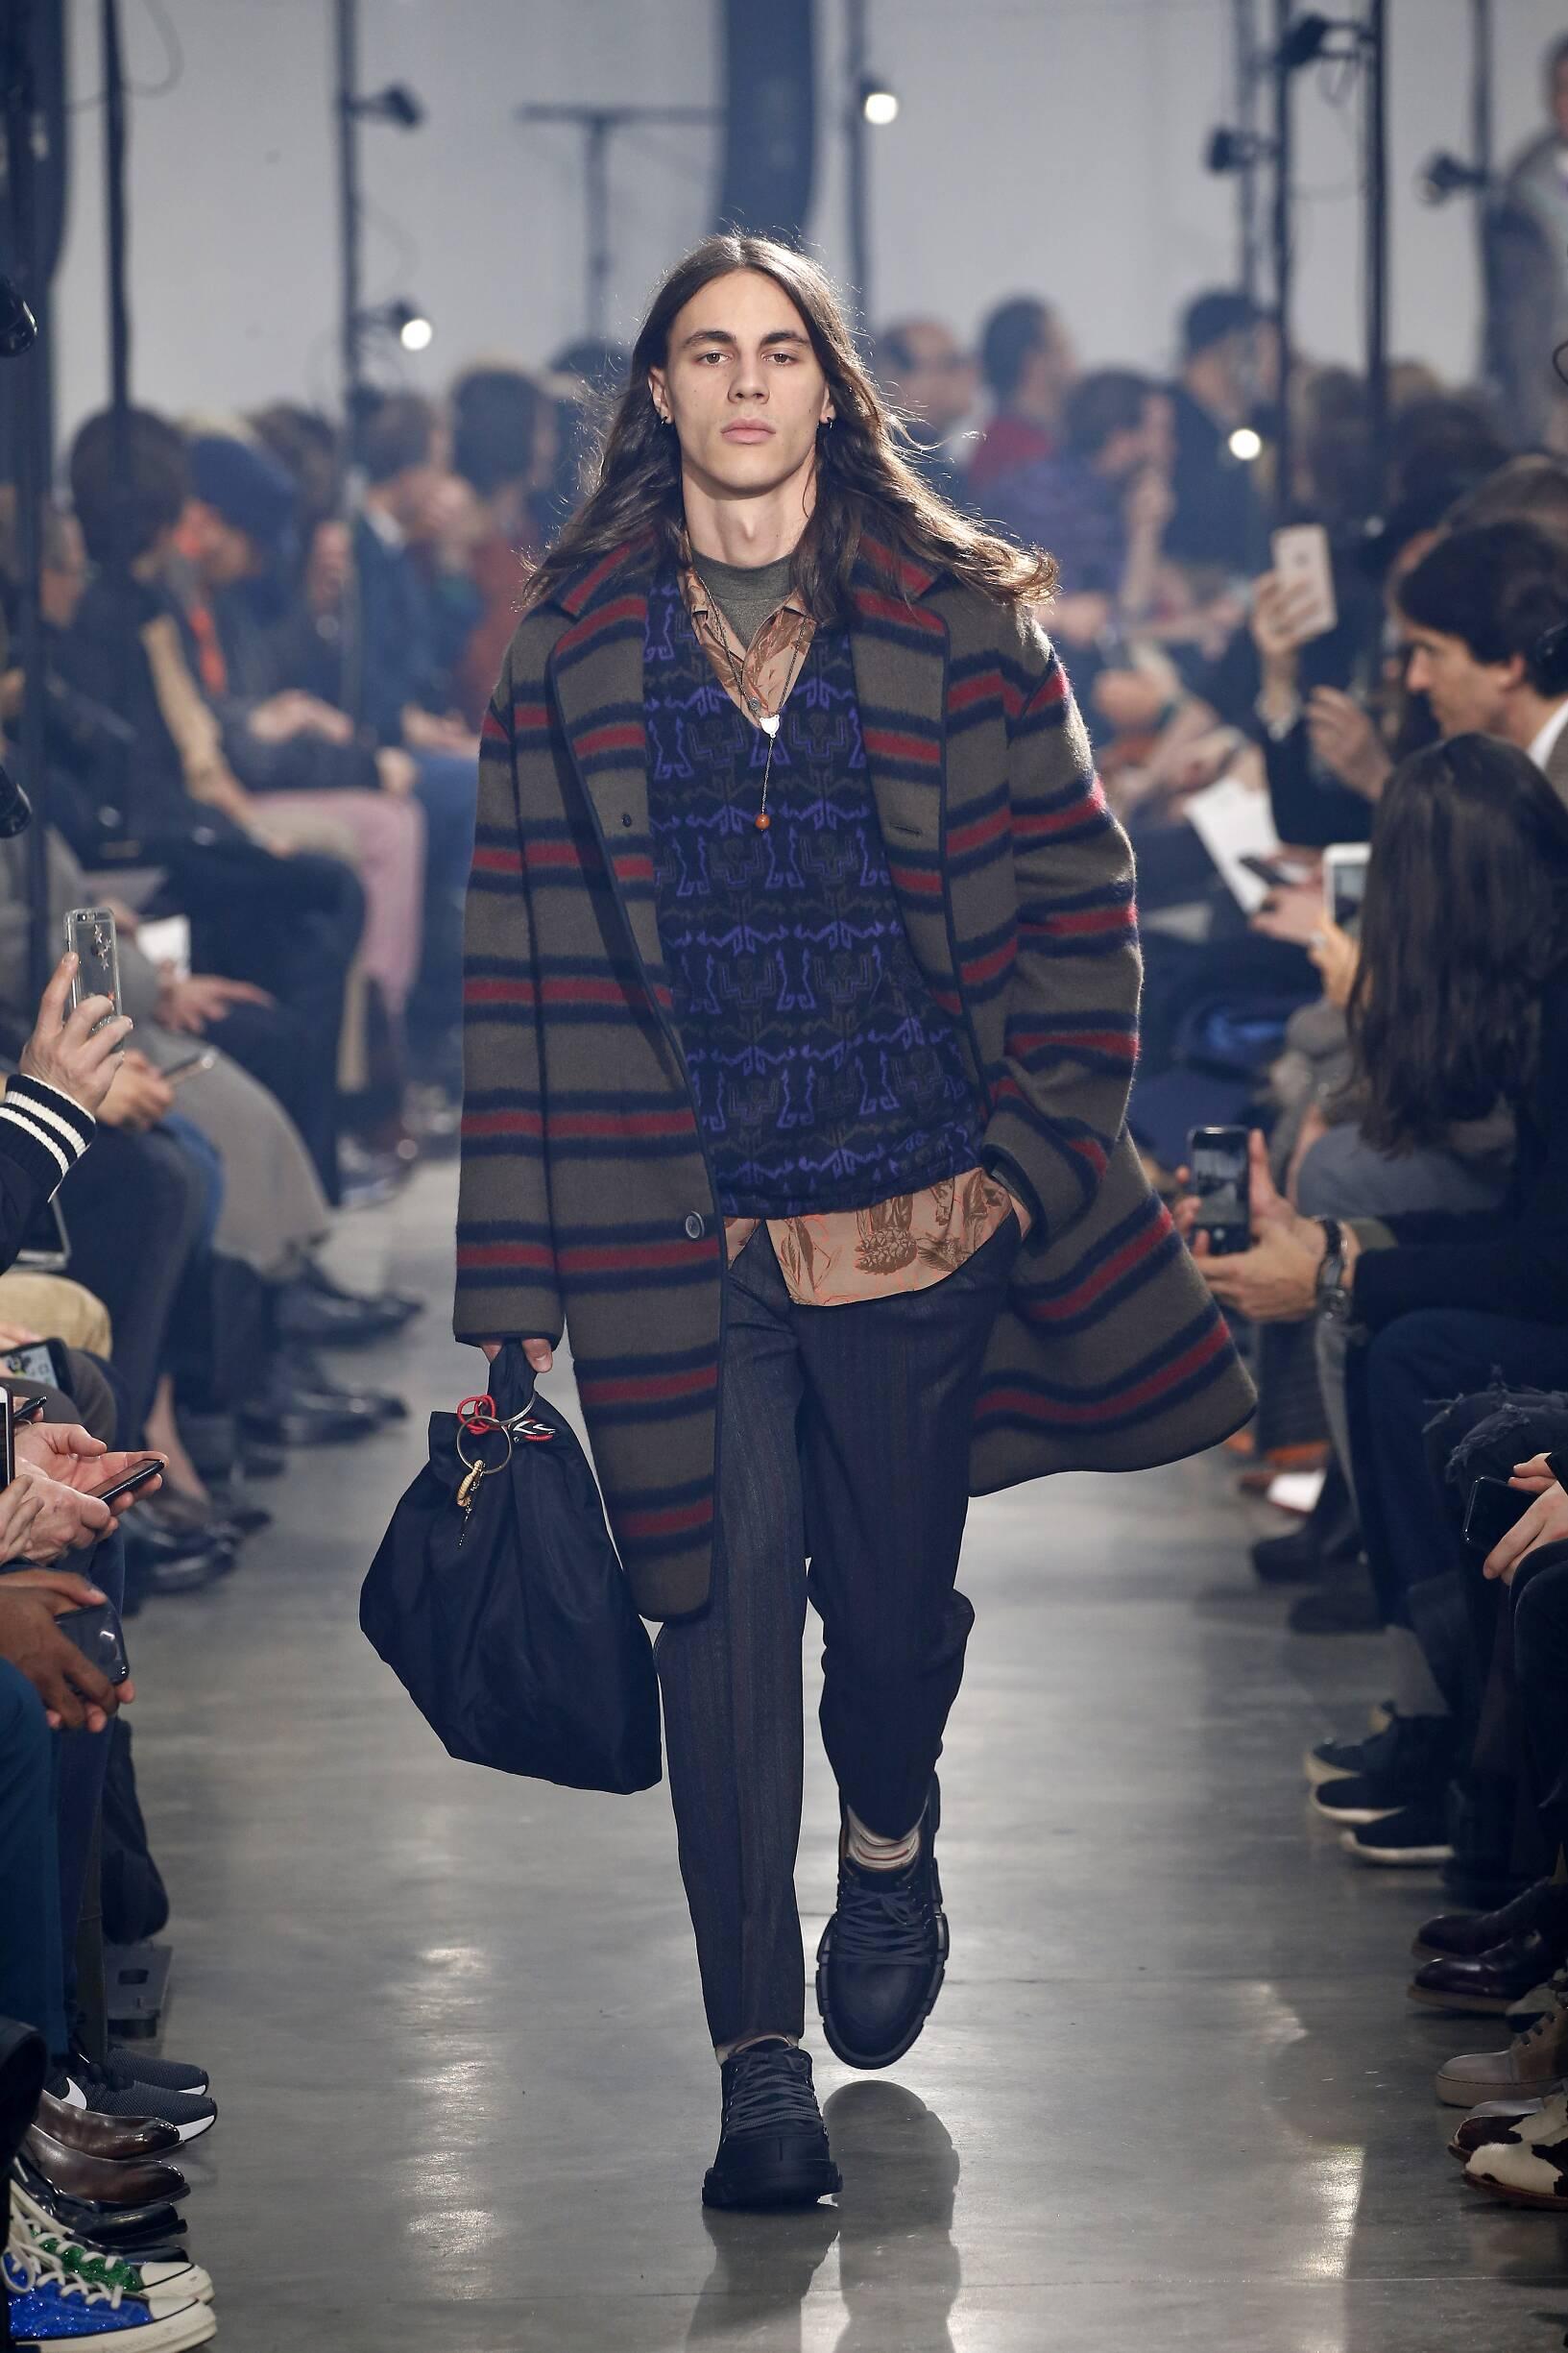 Fall Fashion Man Trends 2018 Lanvin